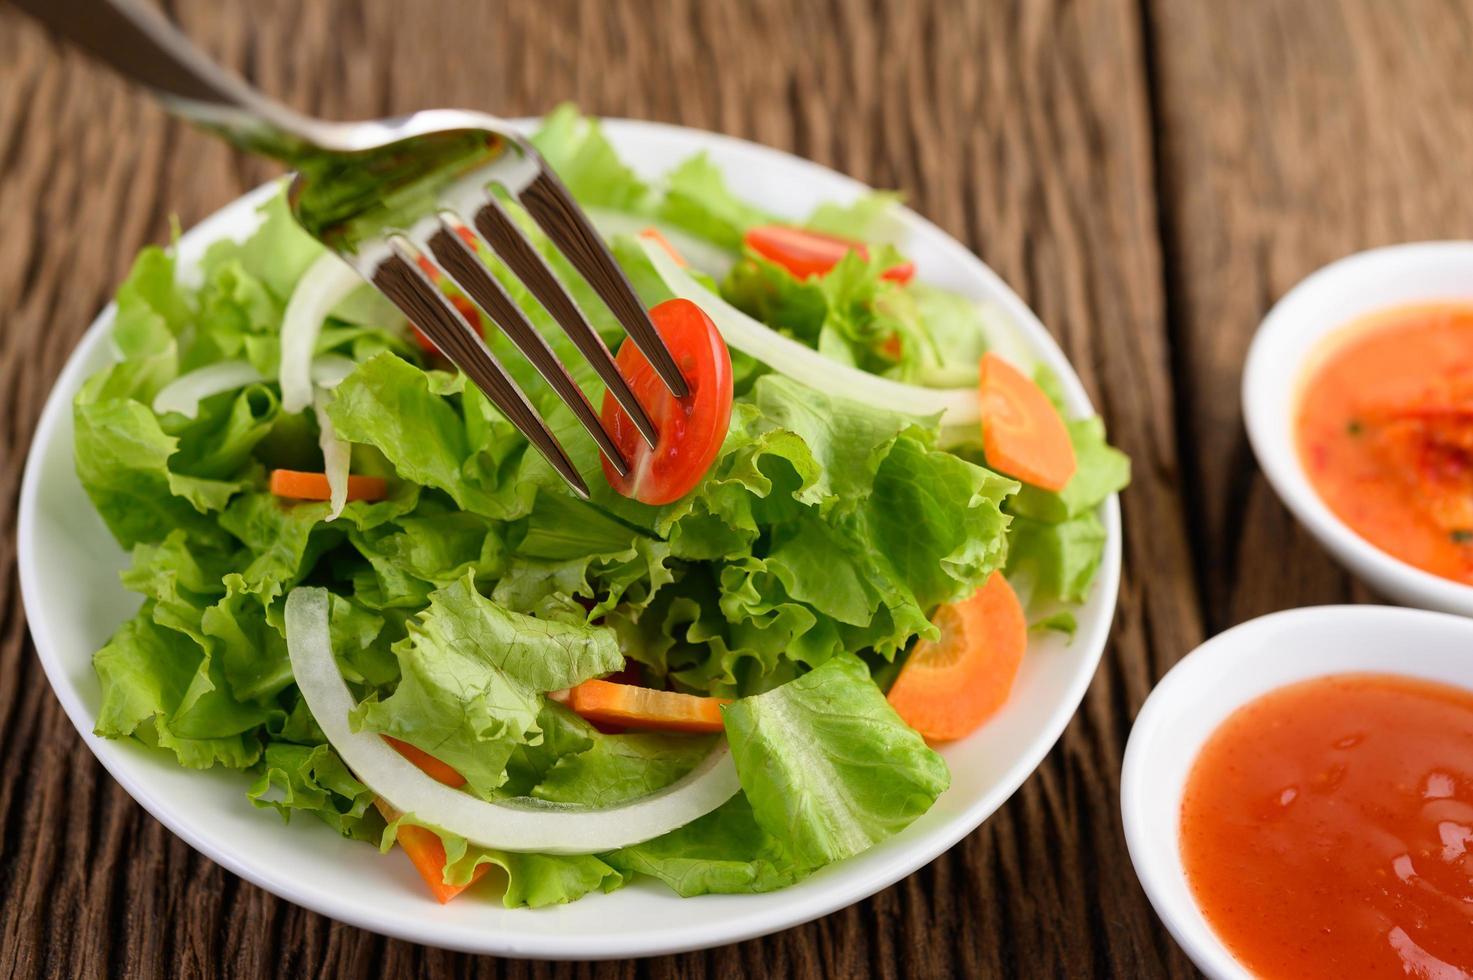 ensalada fresca en una mesa de madera foto